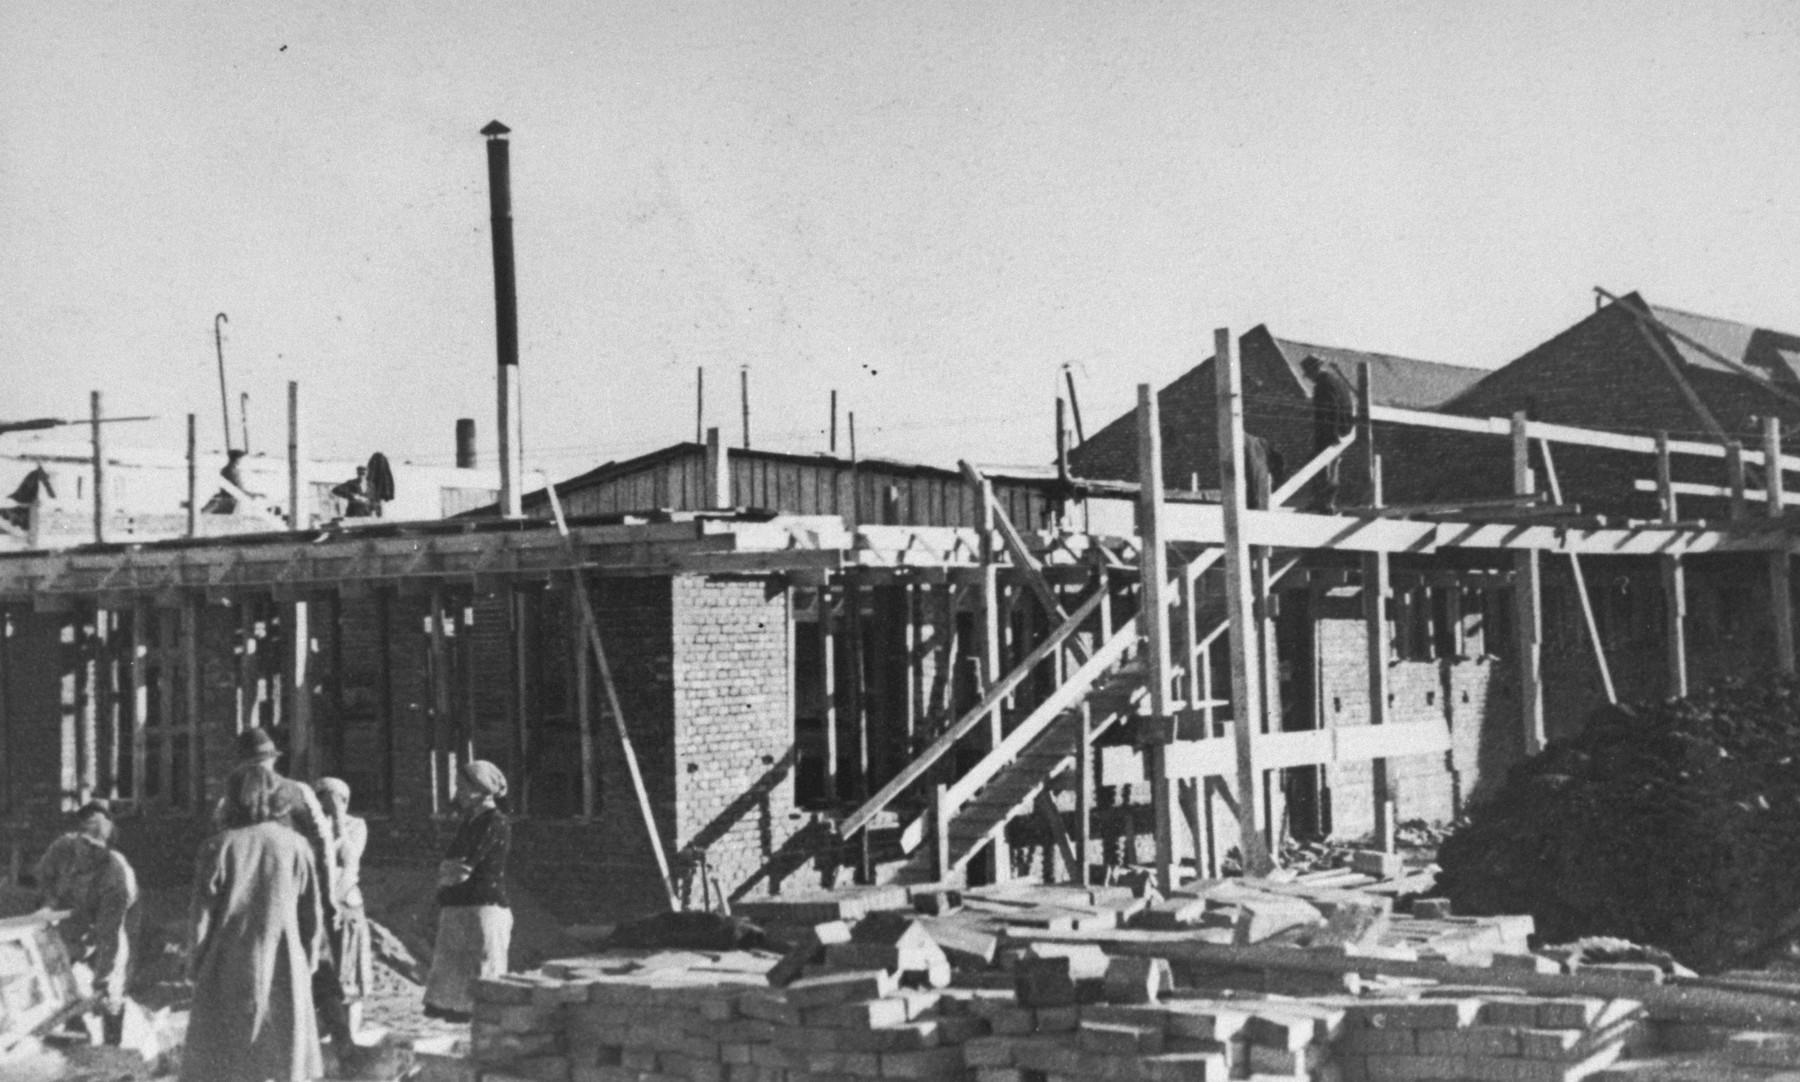 The construction of barracks at Oskar Schindler's armaments factory in Bruennlitz.